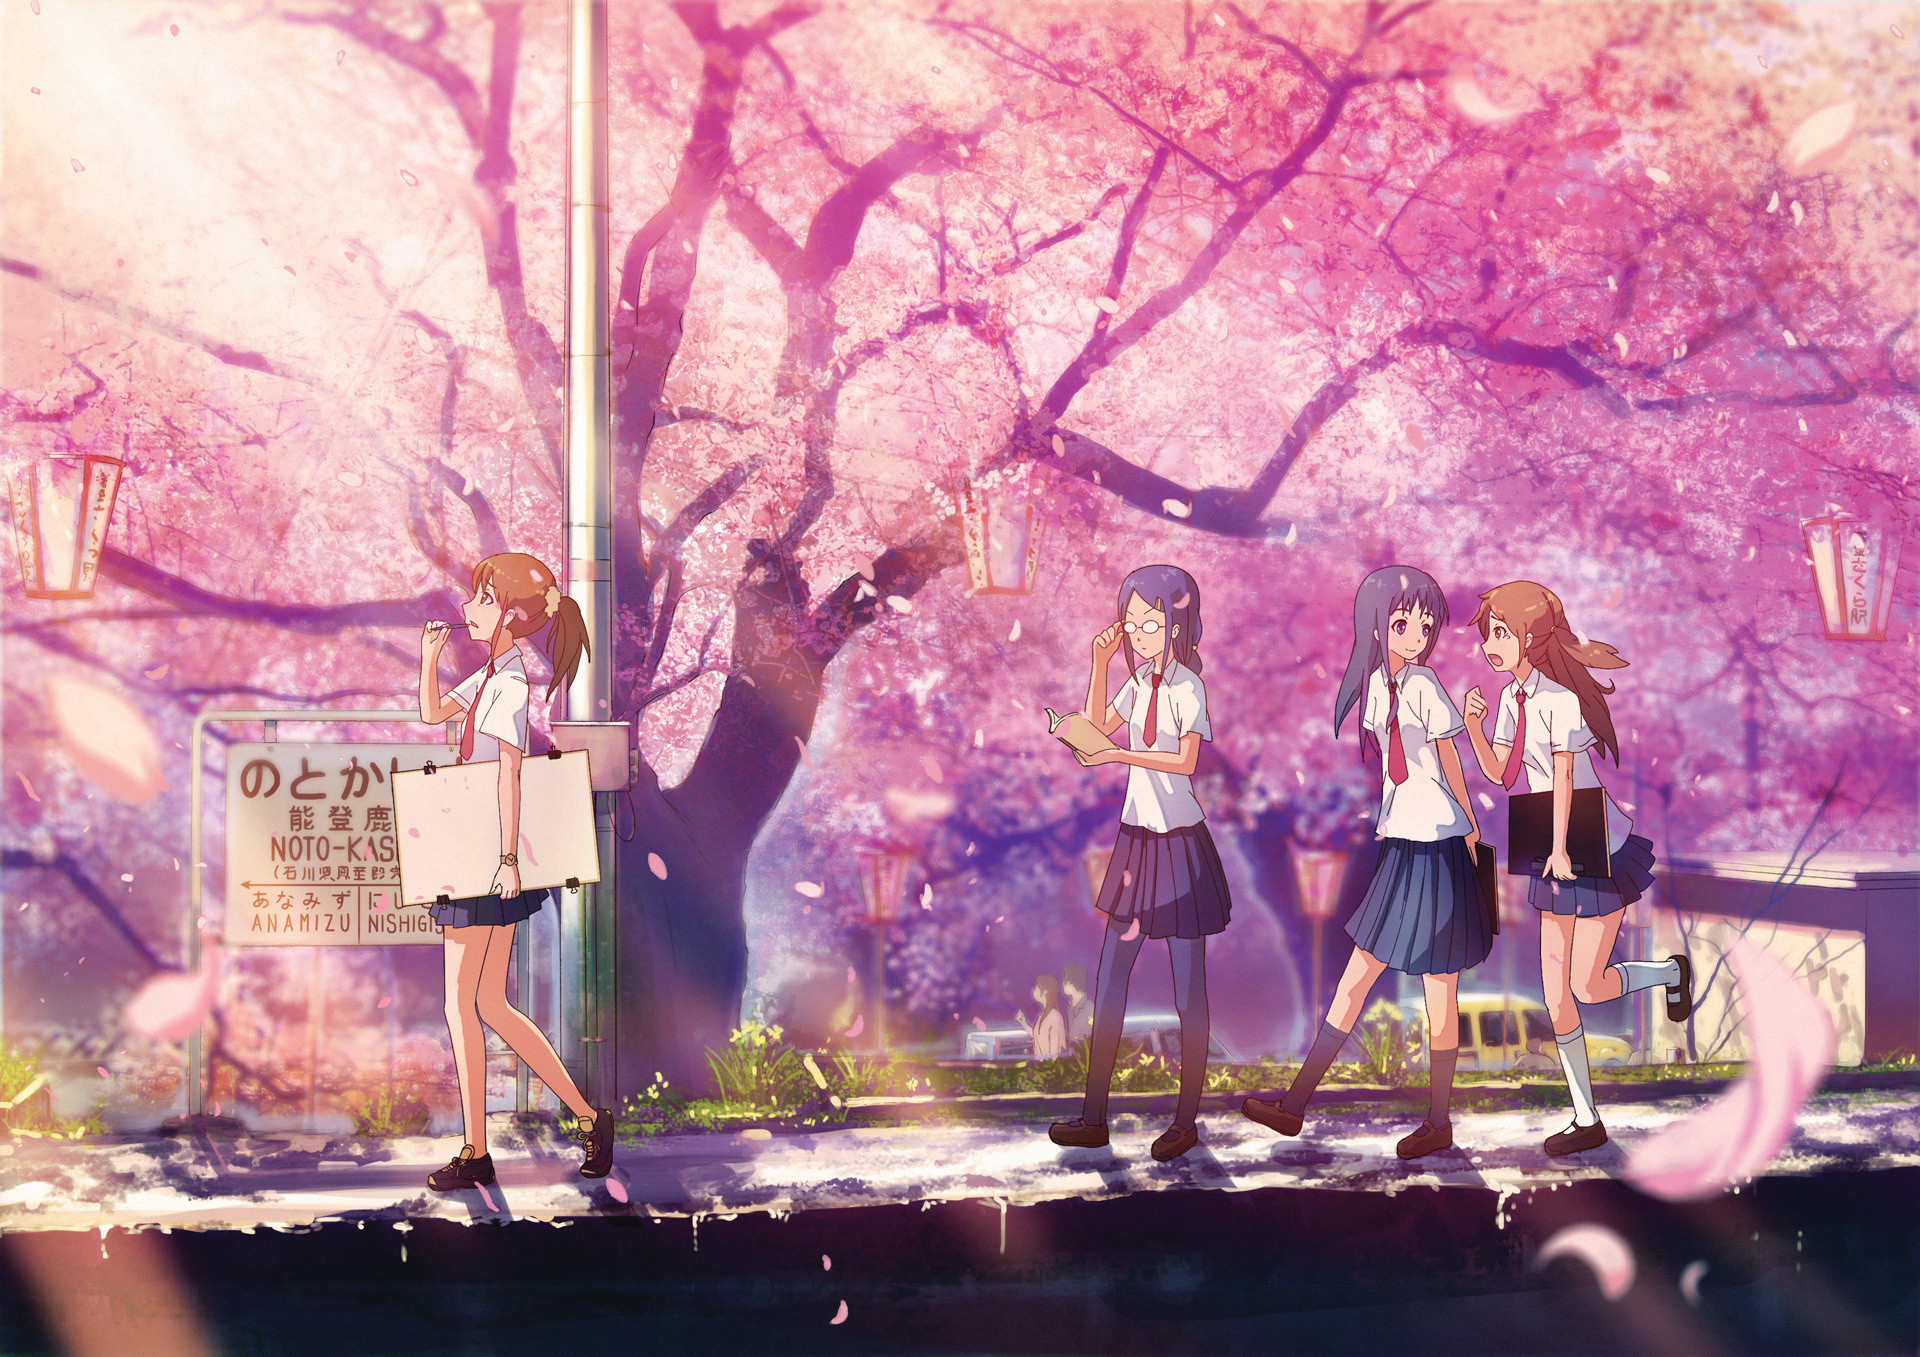 Anime Scenery wallpaper | Anime Landscape | Pinterest | Anime scenery,  Scenery and Anime